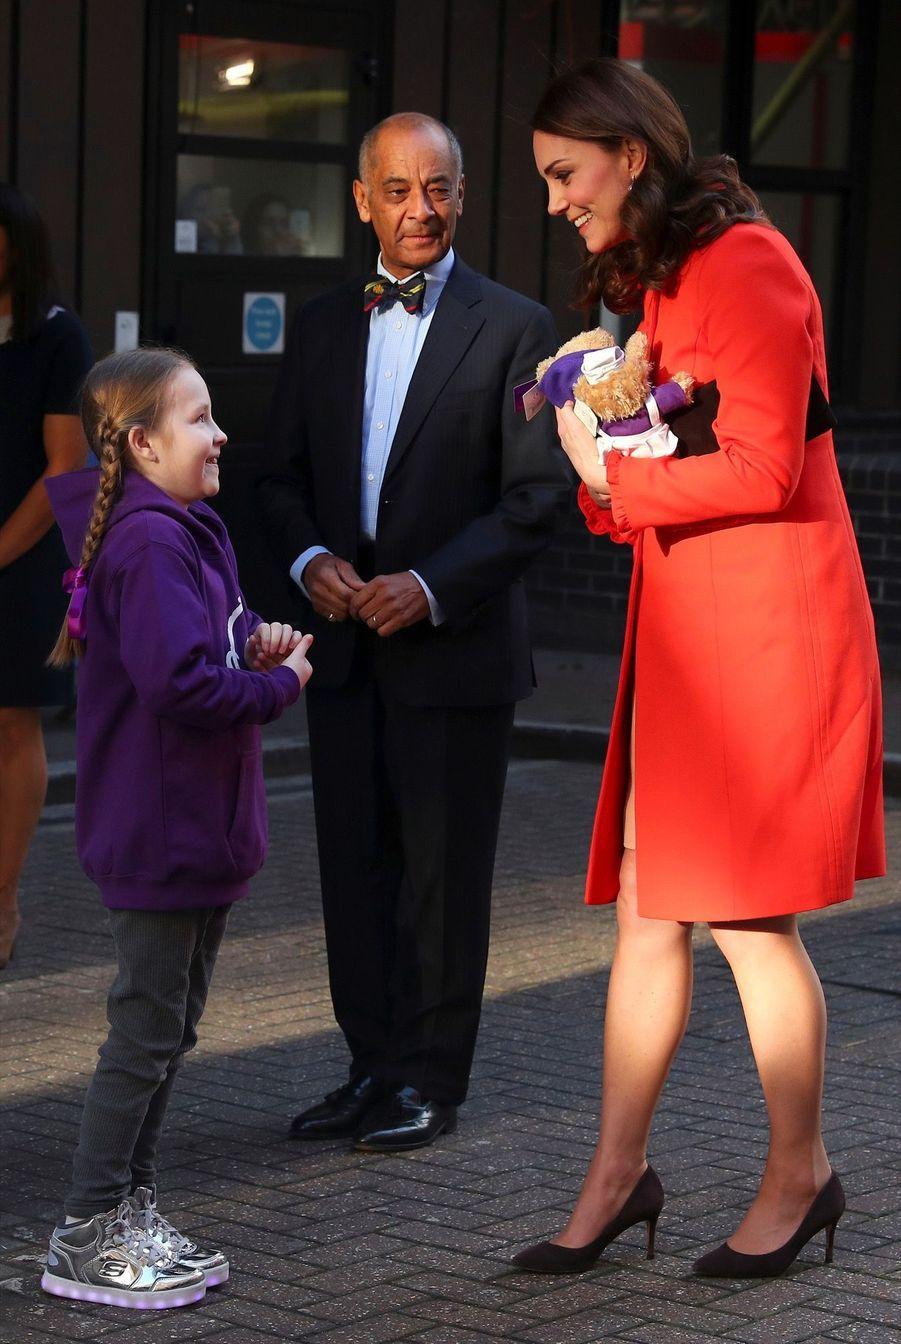 Kate Middleton Enceinte Au Chevet De Rafael, Au Great Ormond Street Hospital 13